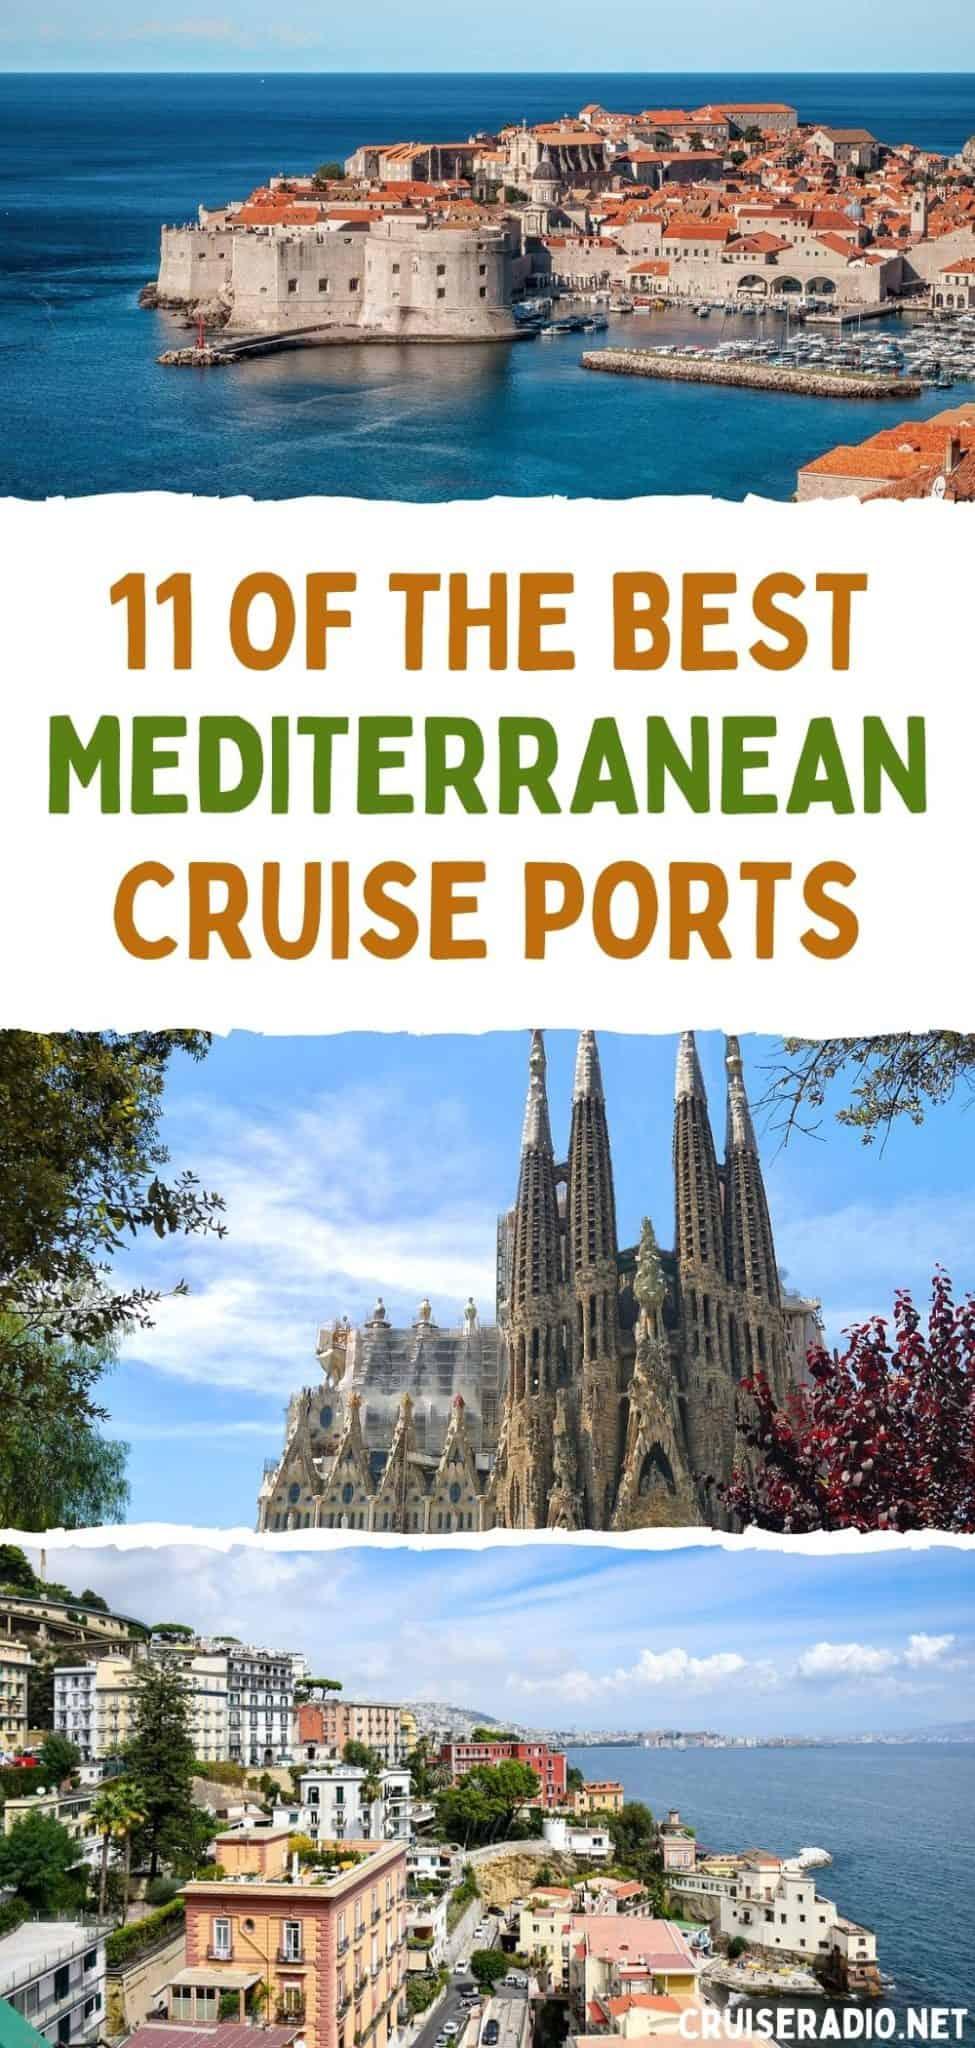 11 of the best mediterranean cruise ports